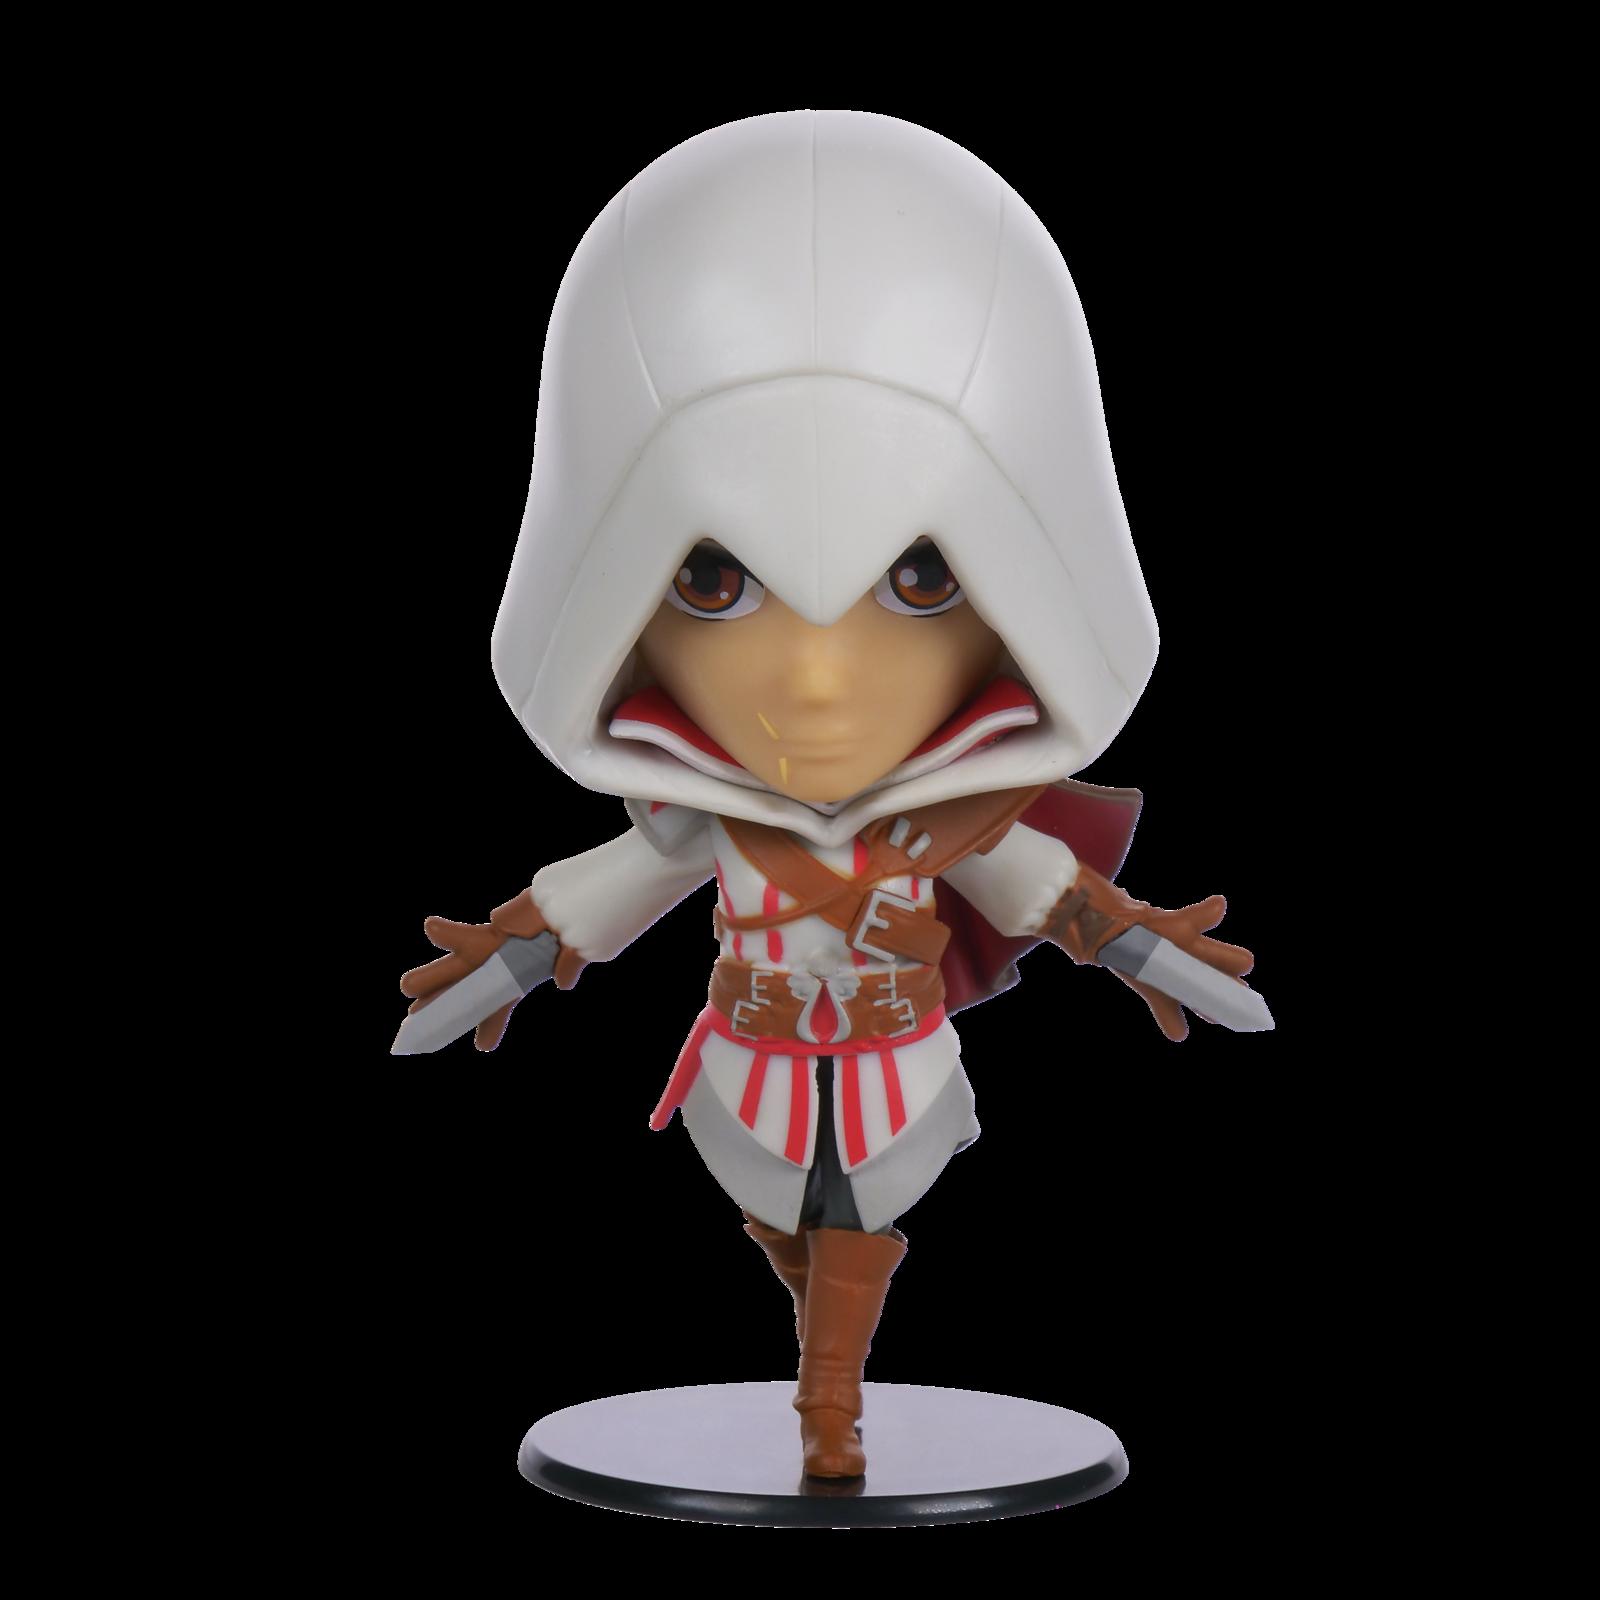 Ezio Auditore 4 Minifigure At Mighty Ape Australia